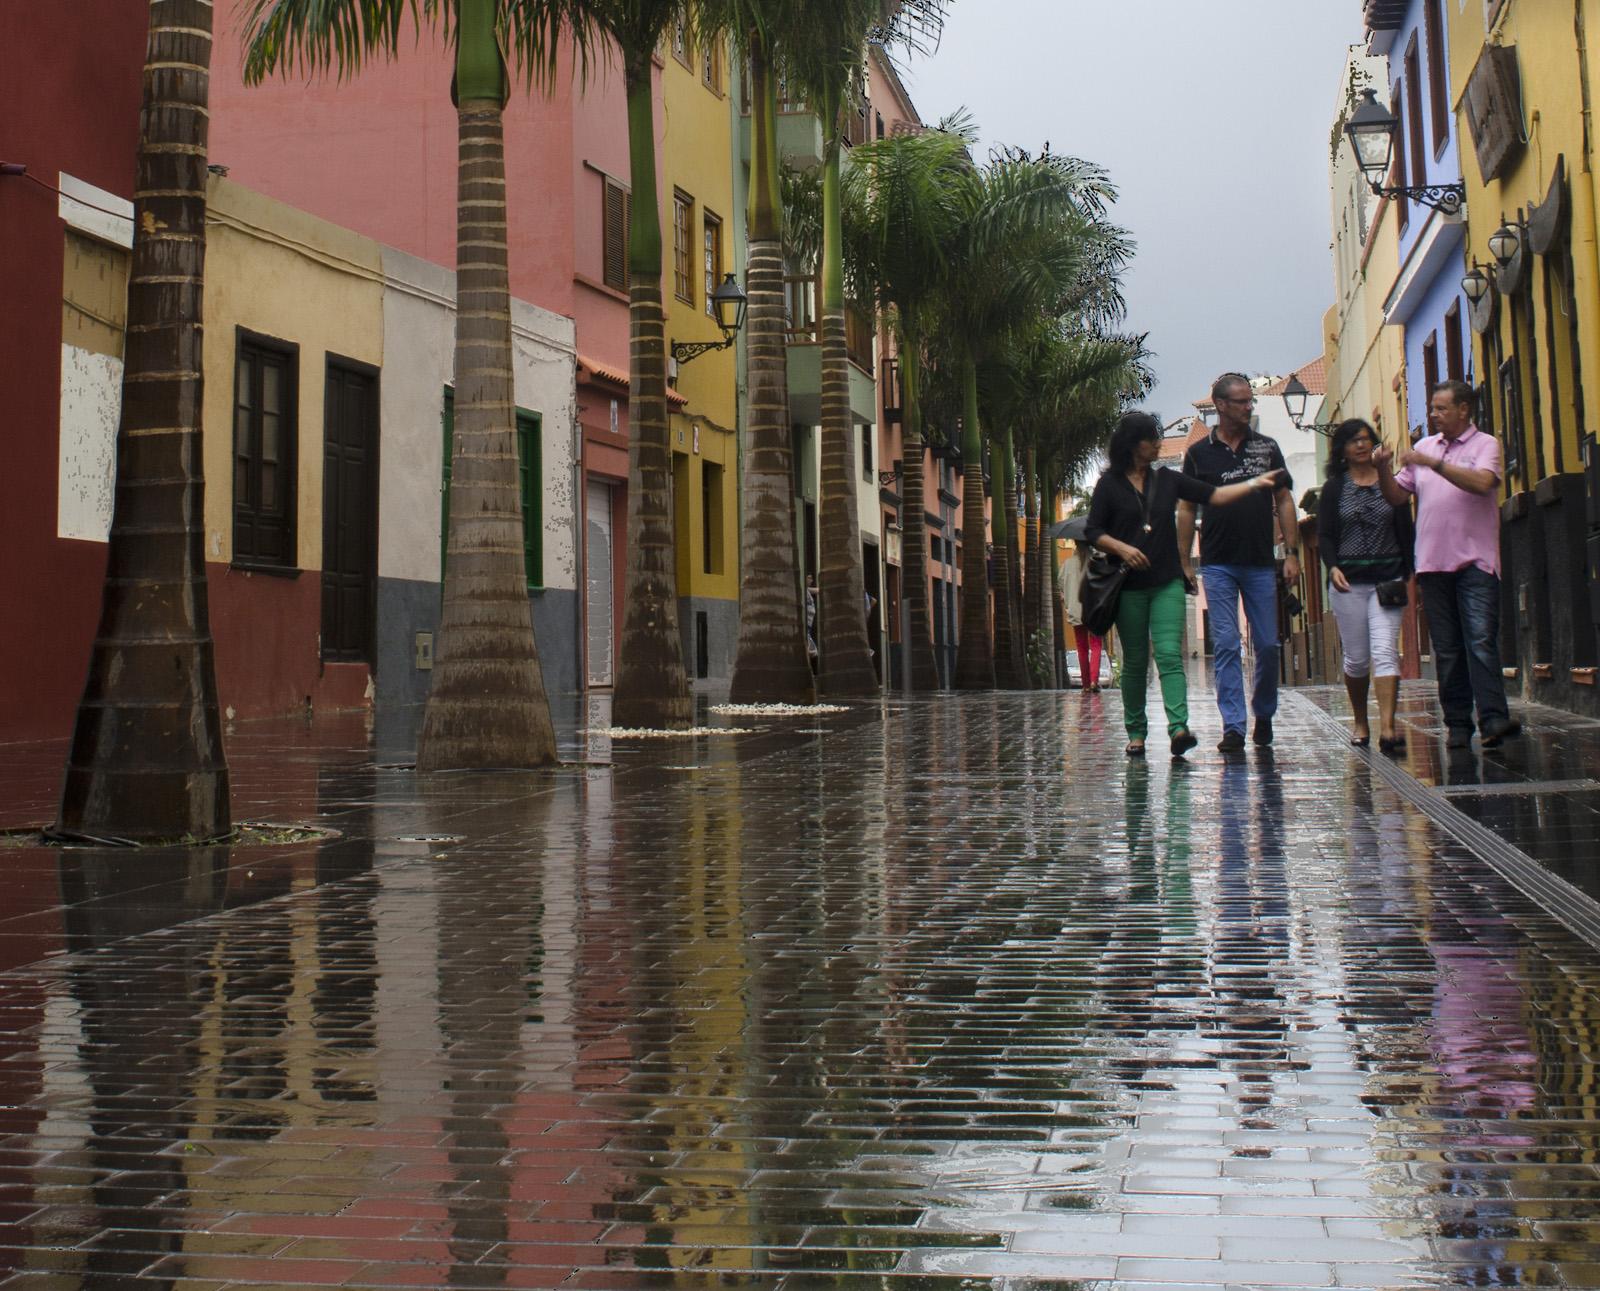 Vista de calle peatonal mojada por la lluvia